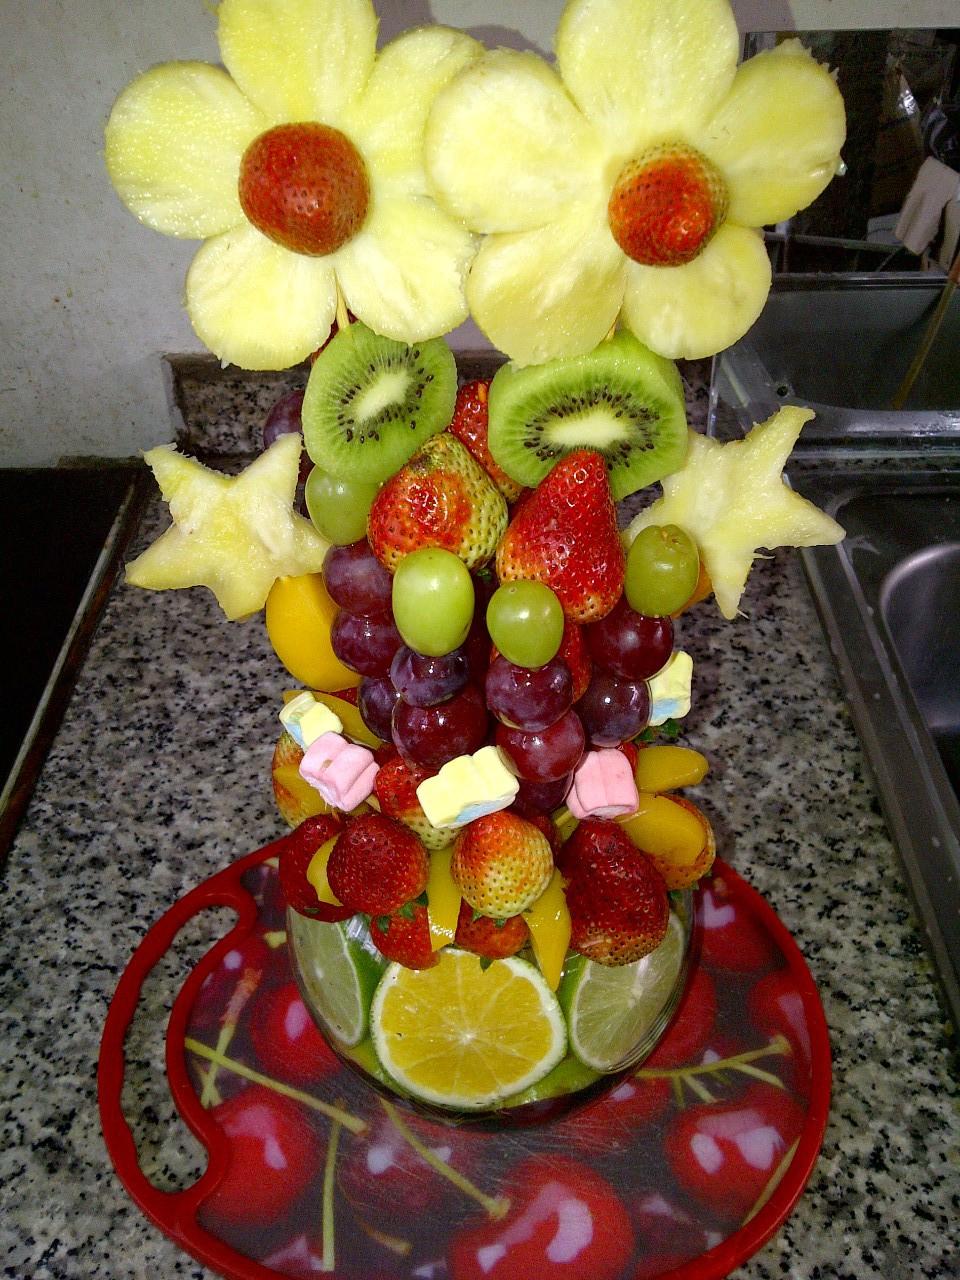 Arreglos Para Mesa De Frutas Wwwmiifotoscom - Centros-de-mesa-de-frutas